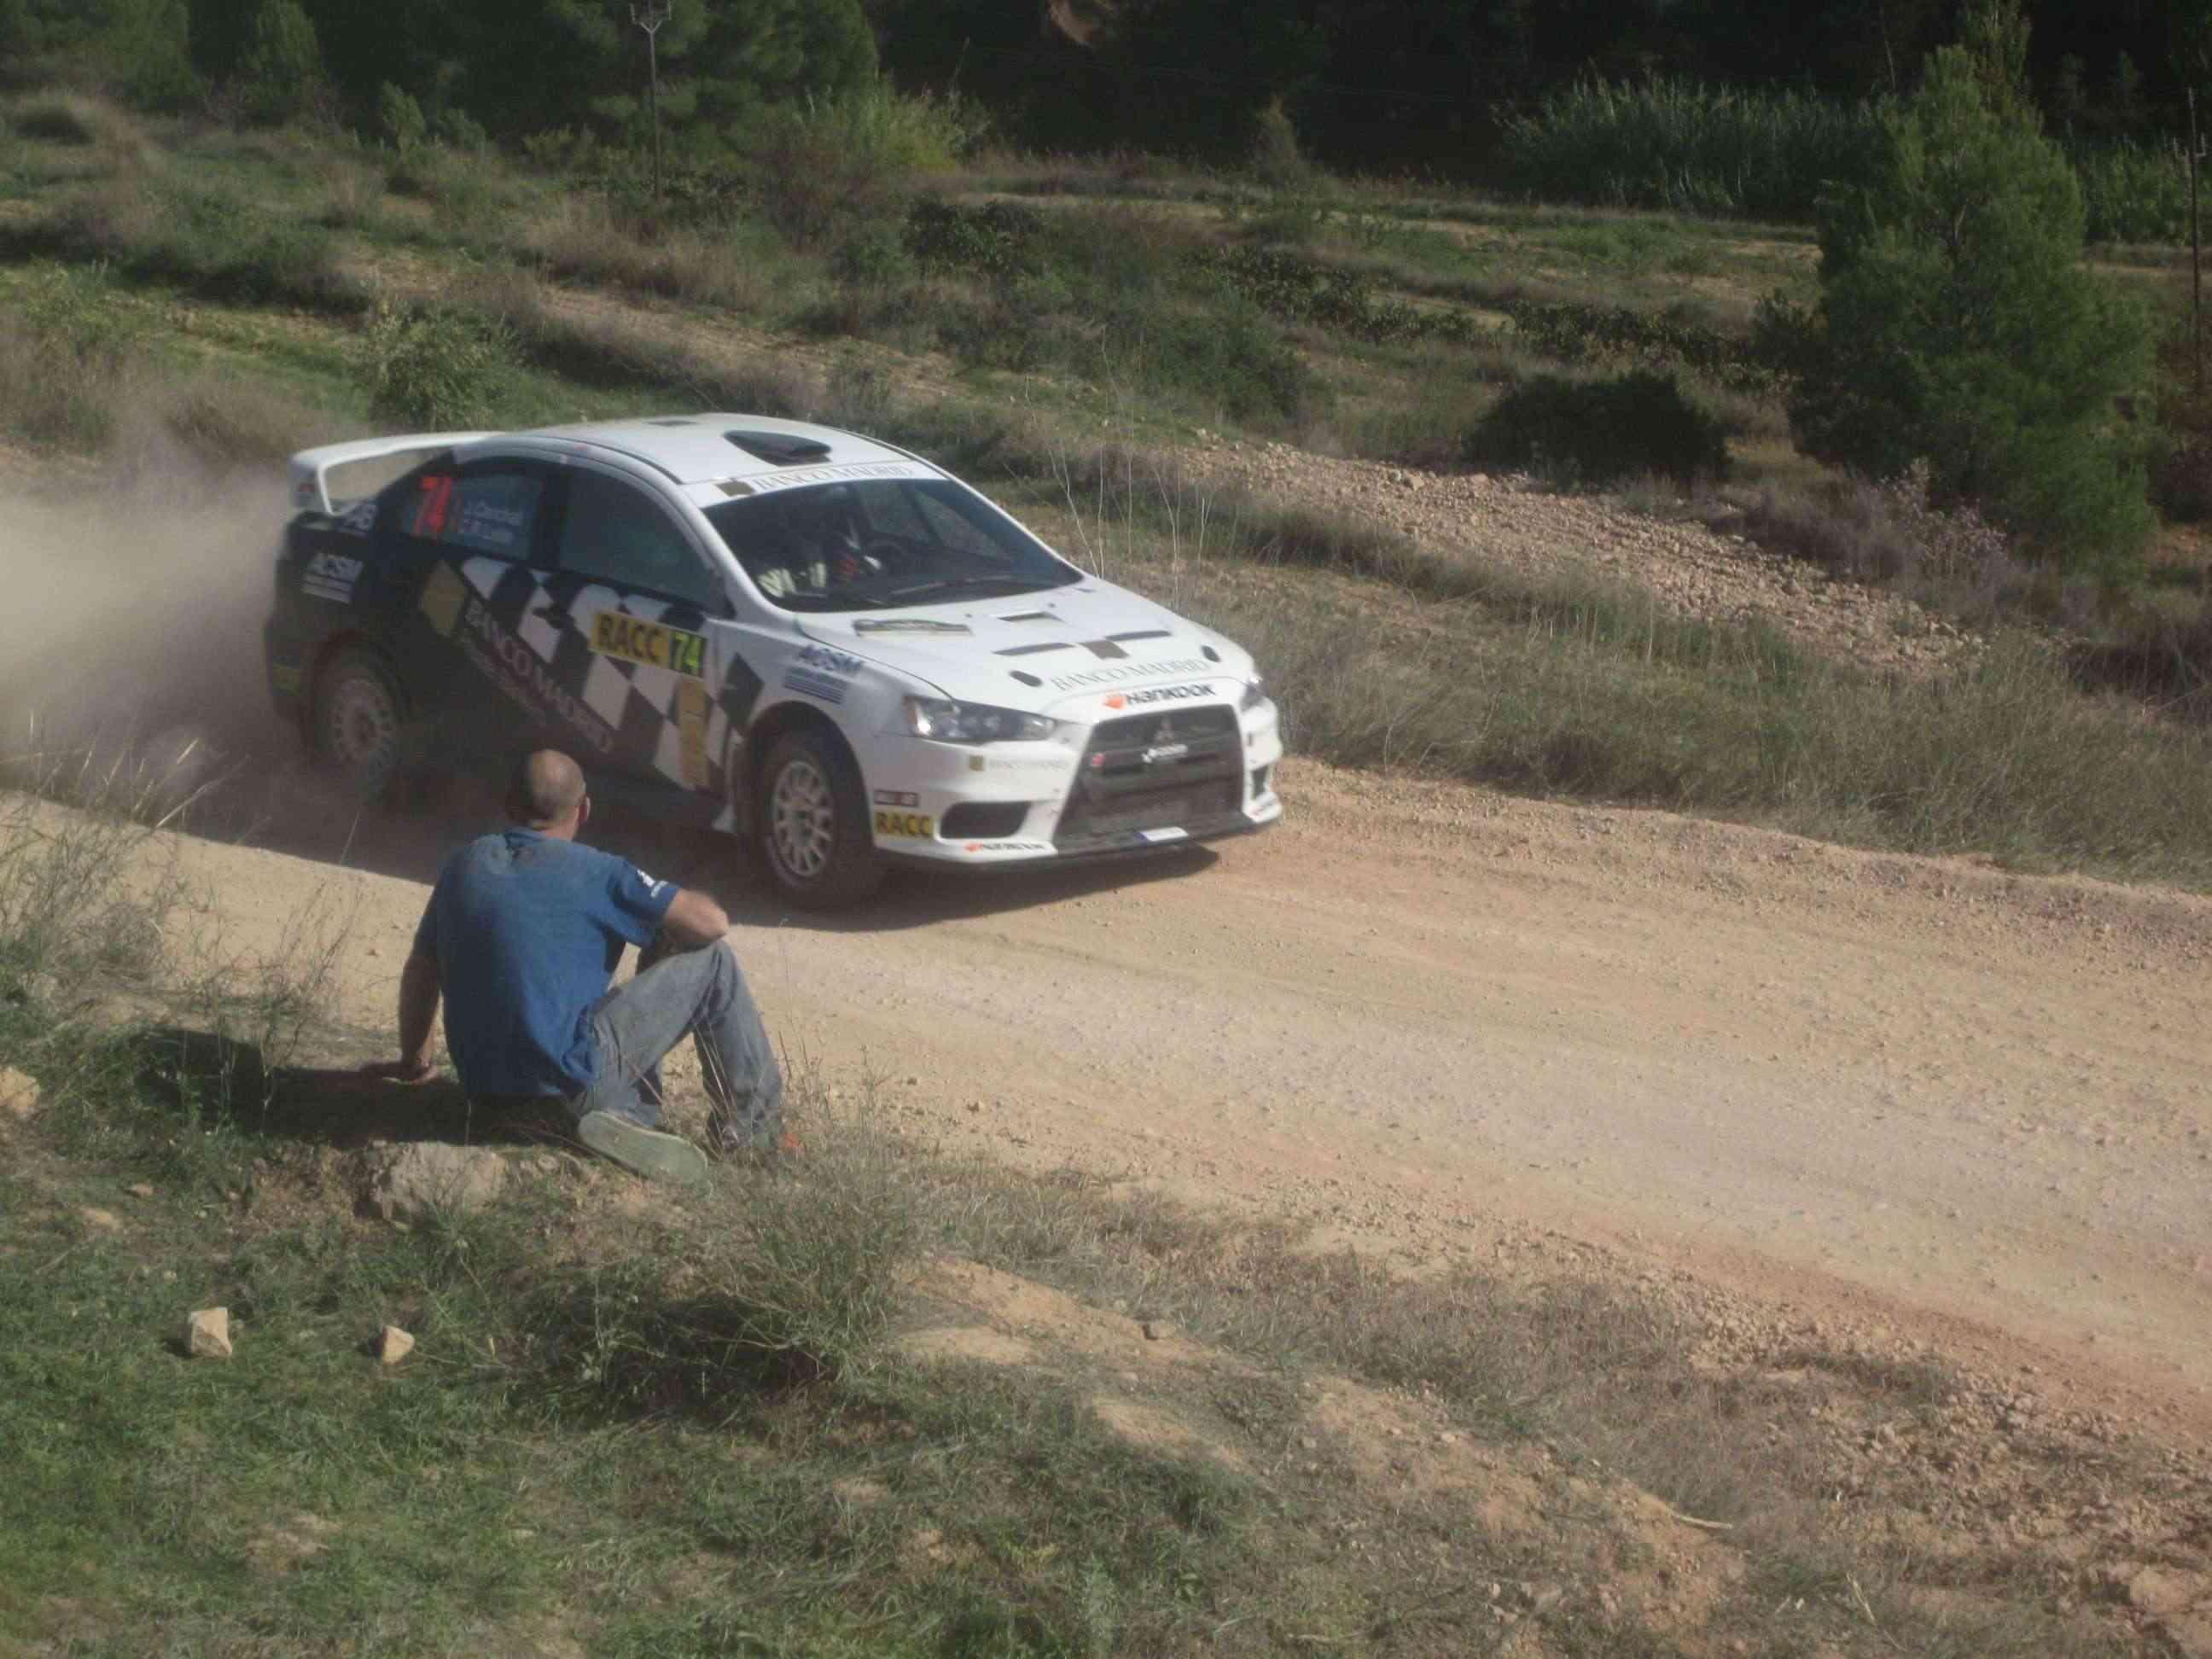 Quedada RaulGuerrero91 y Ruvigas   Rally España  Catalunya-Costa Daurada 2014 Img_8811